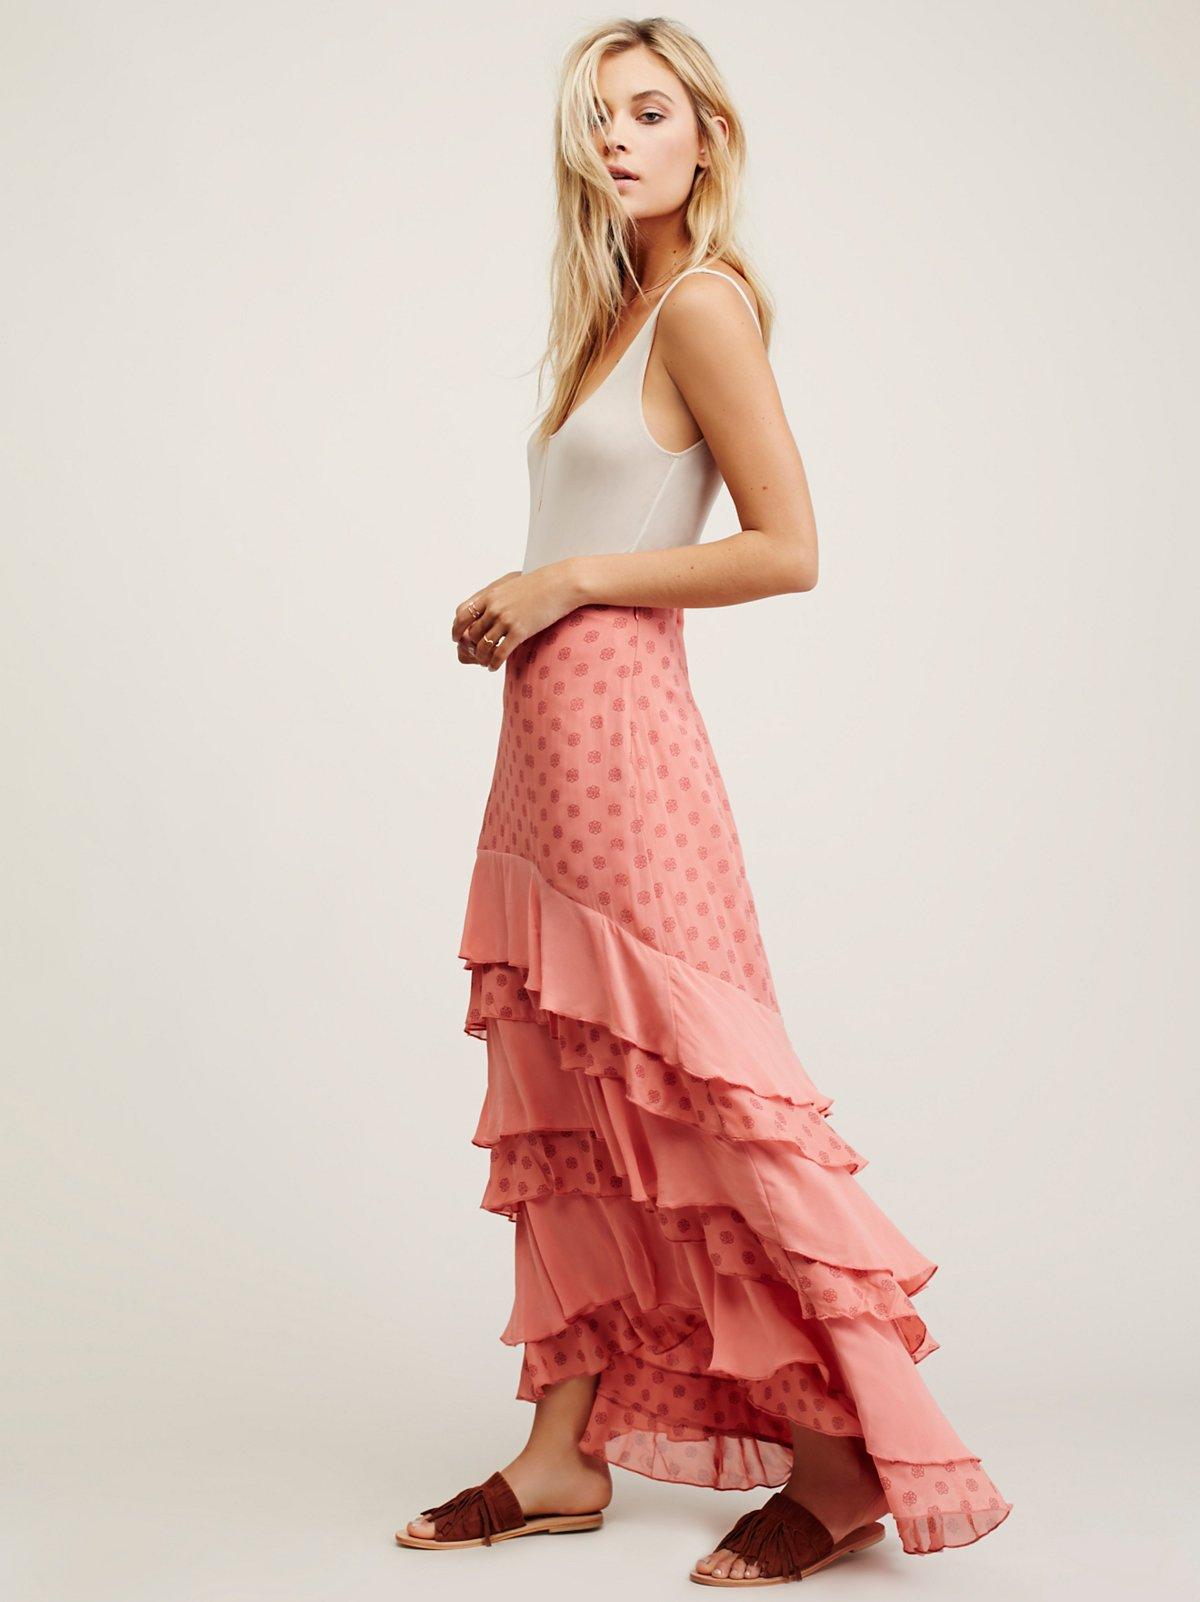 Wildflower荷叶边长款半身裙